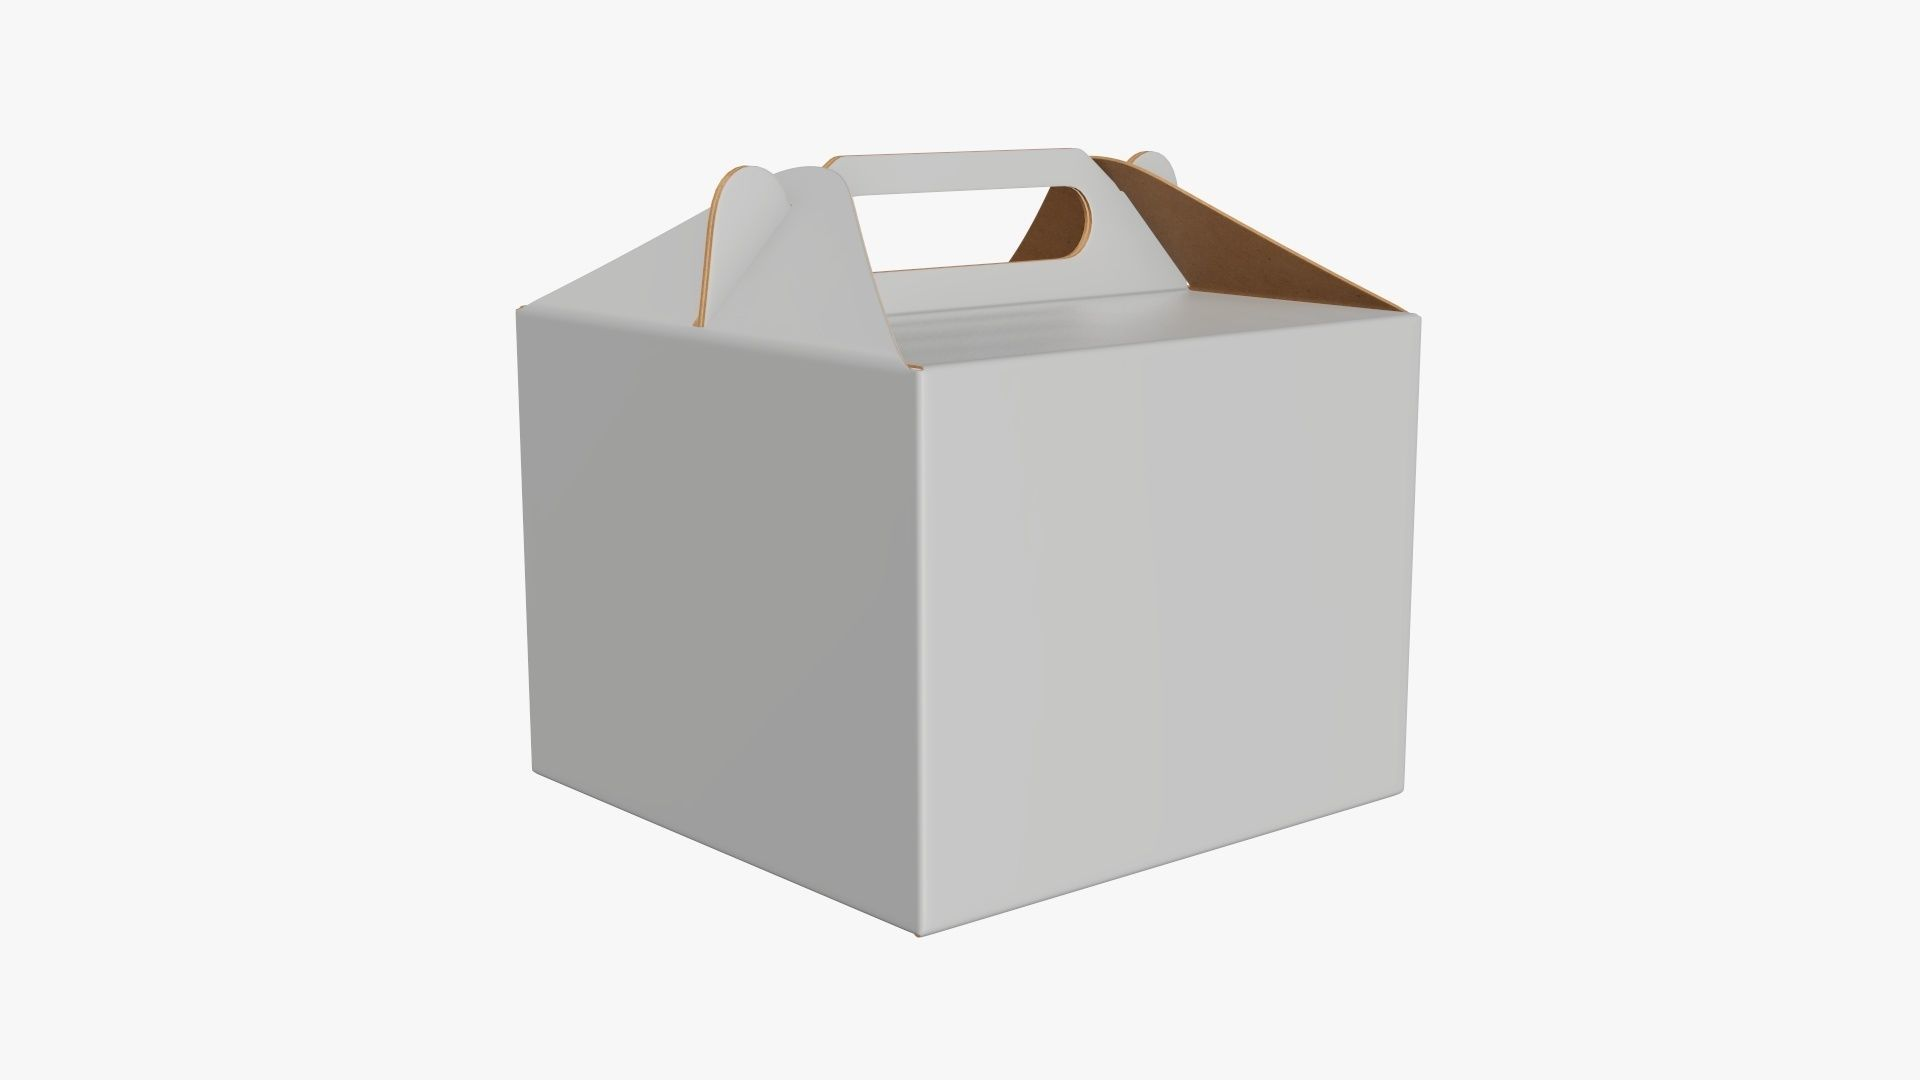 Gable box cardboard food packing 02 white